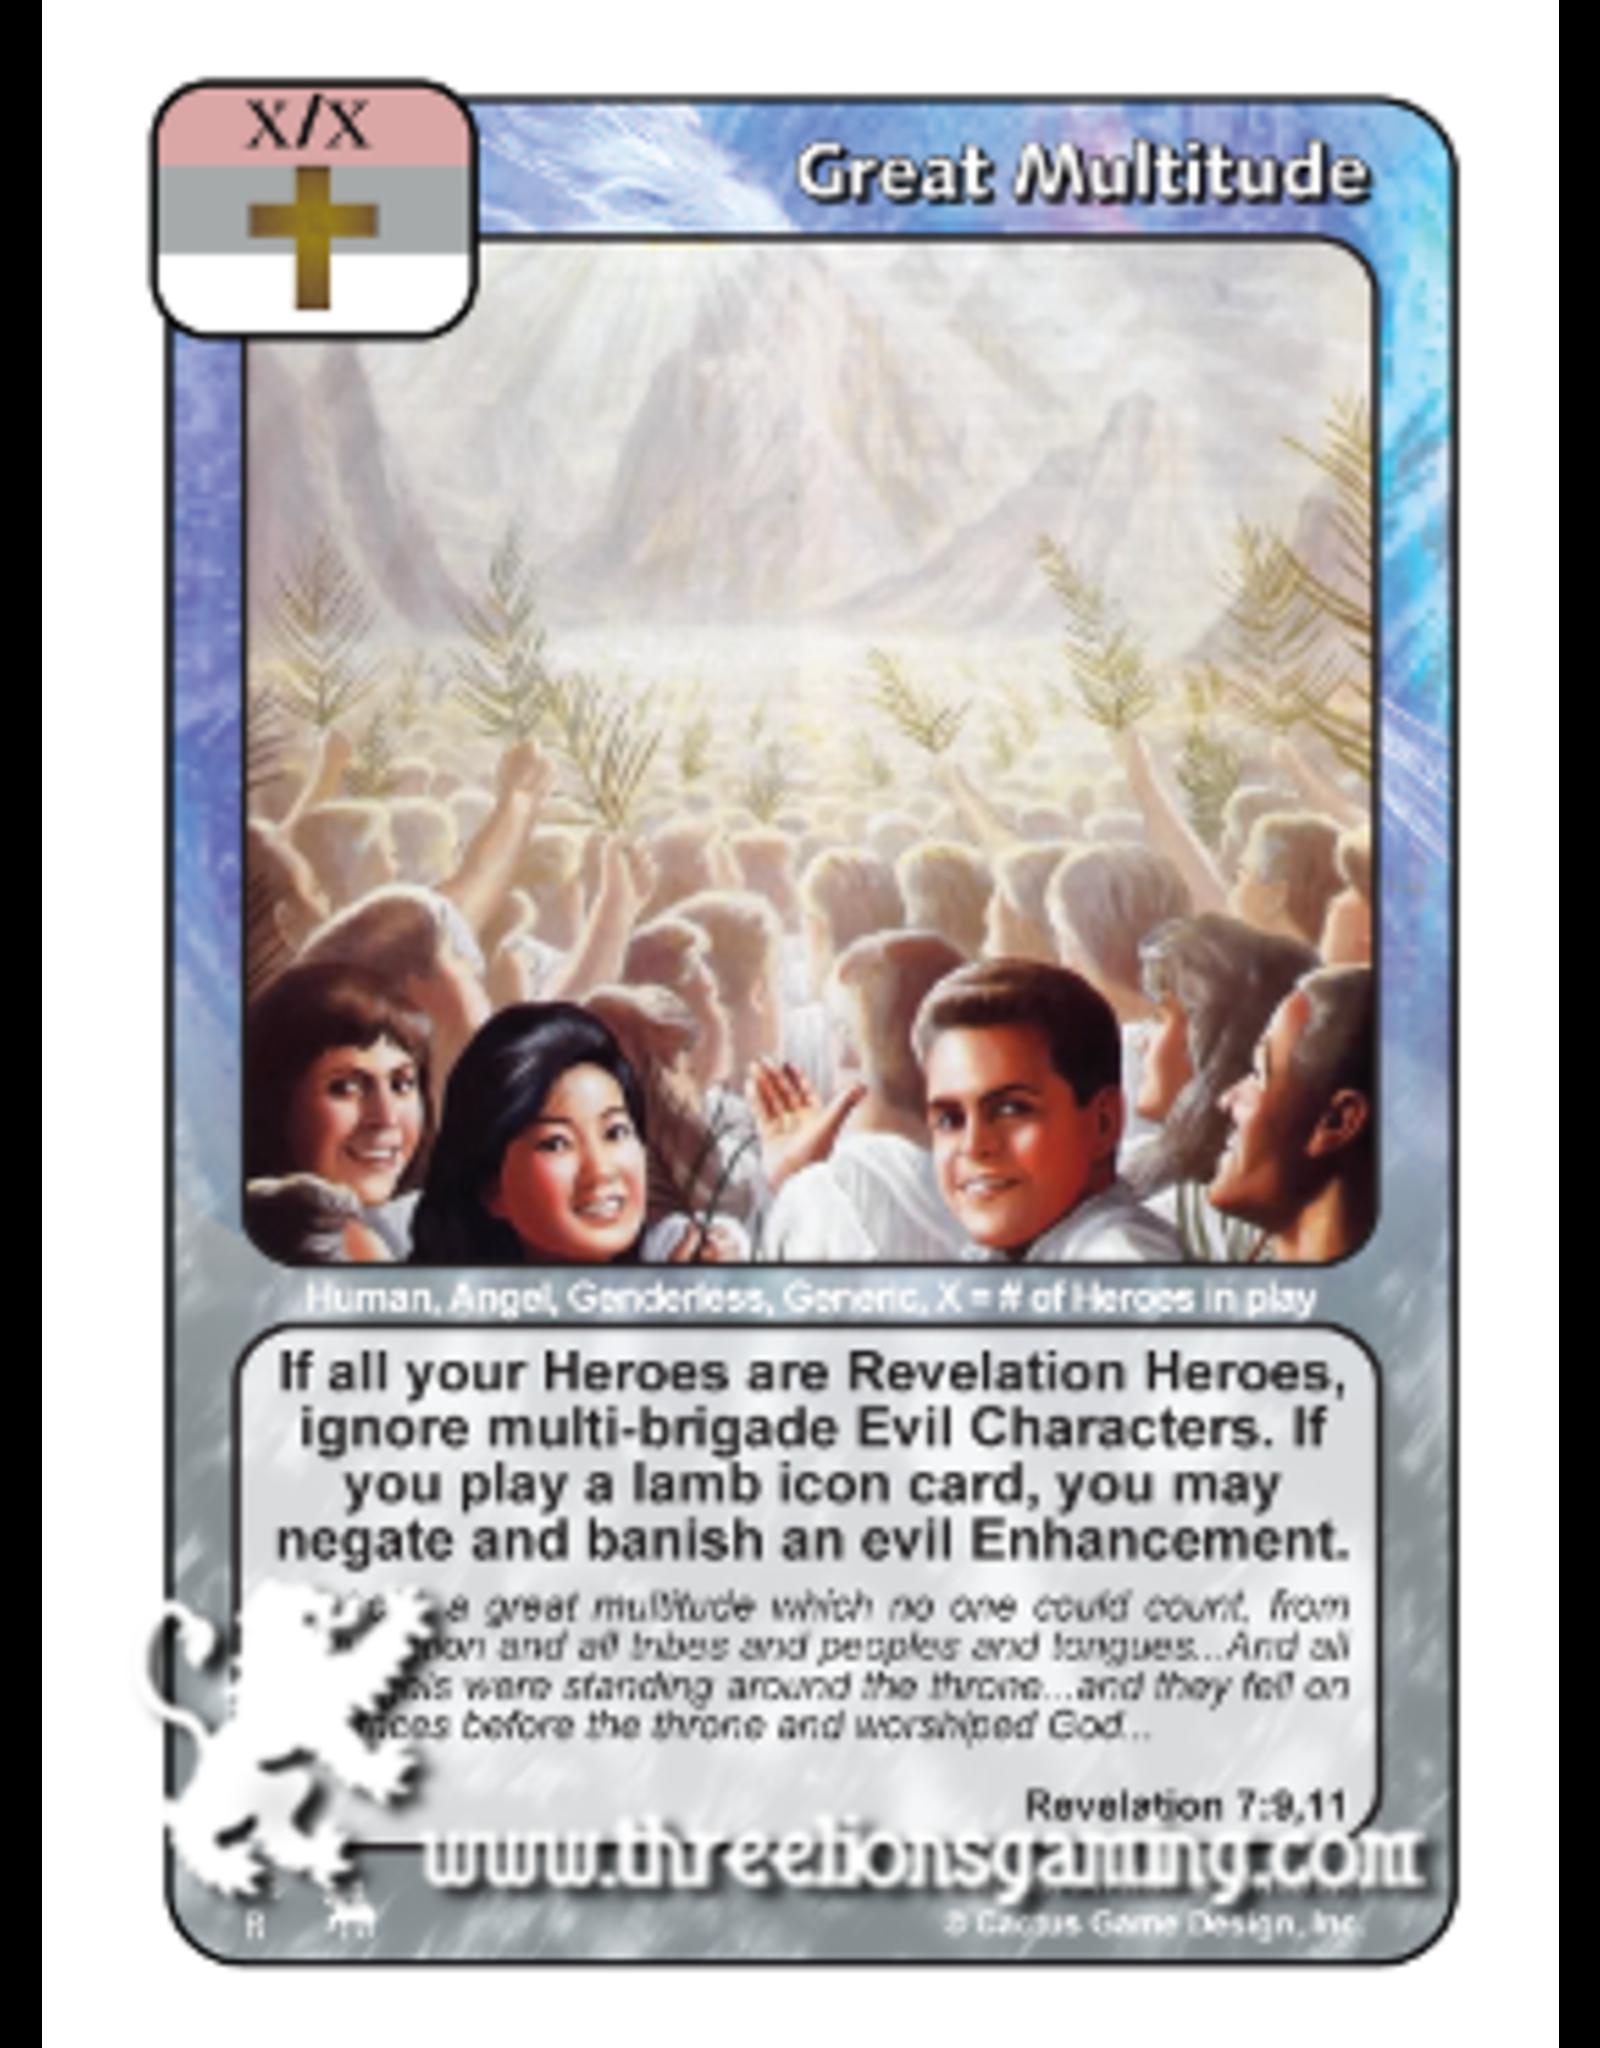 RoJ: Great Multitude